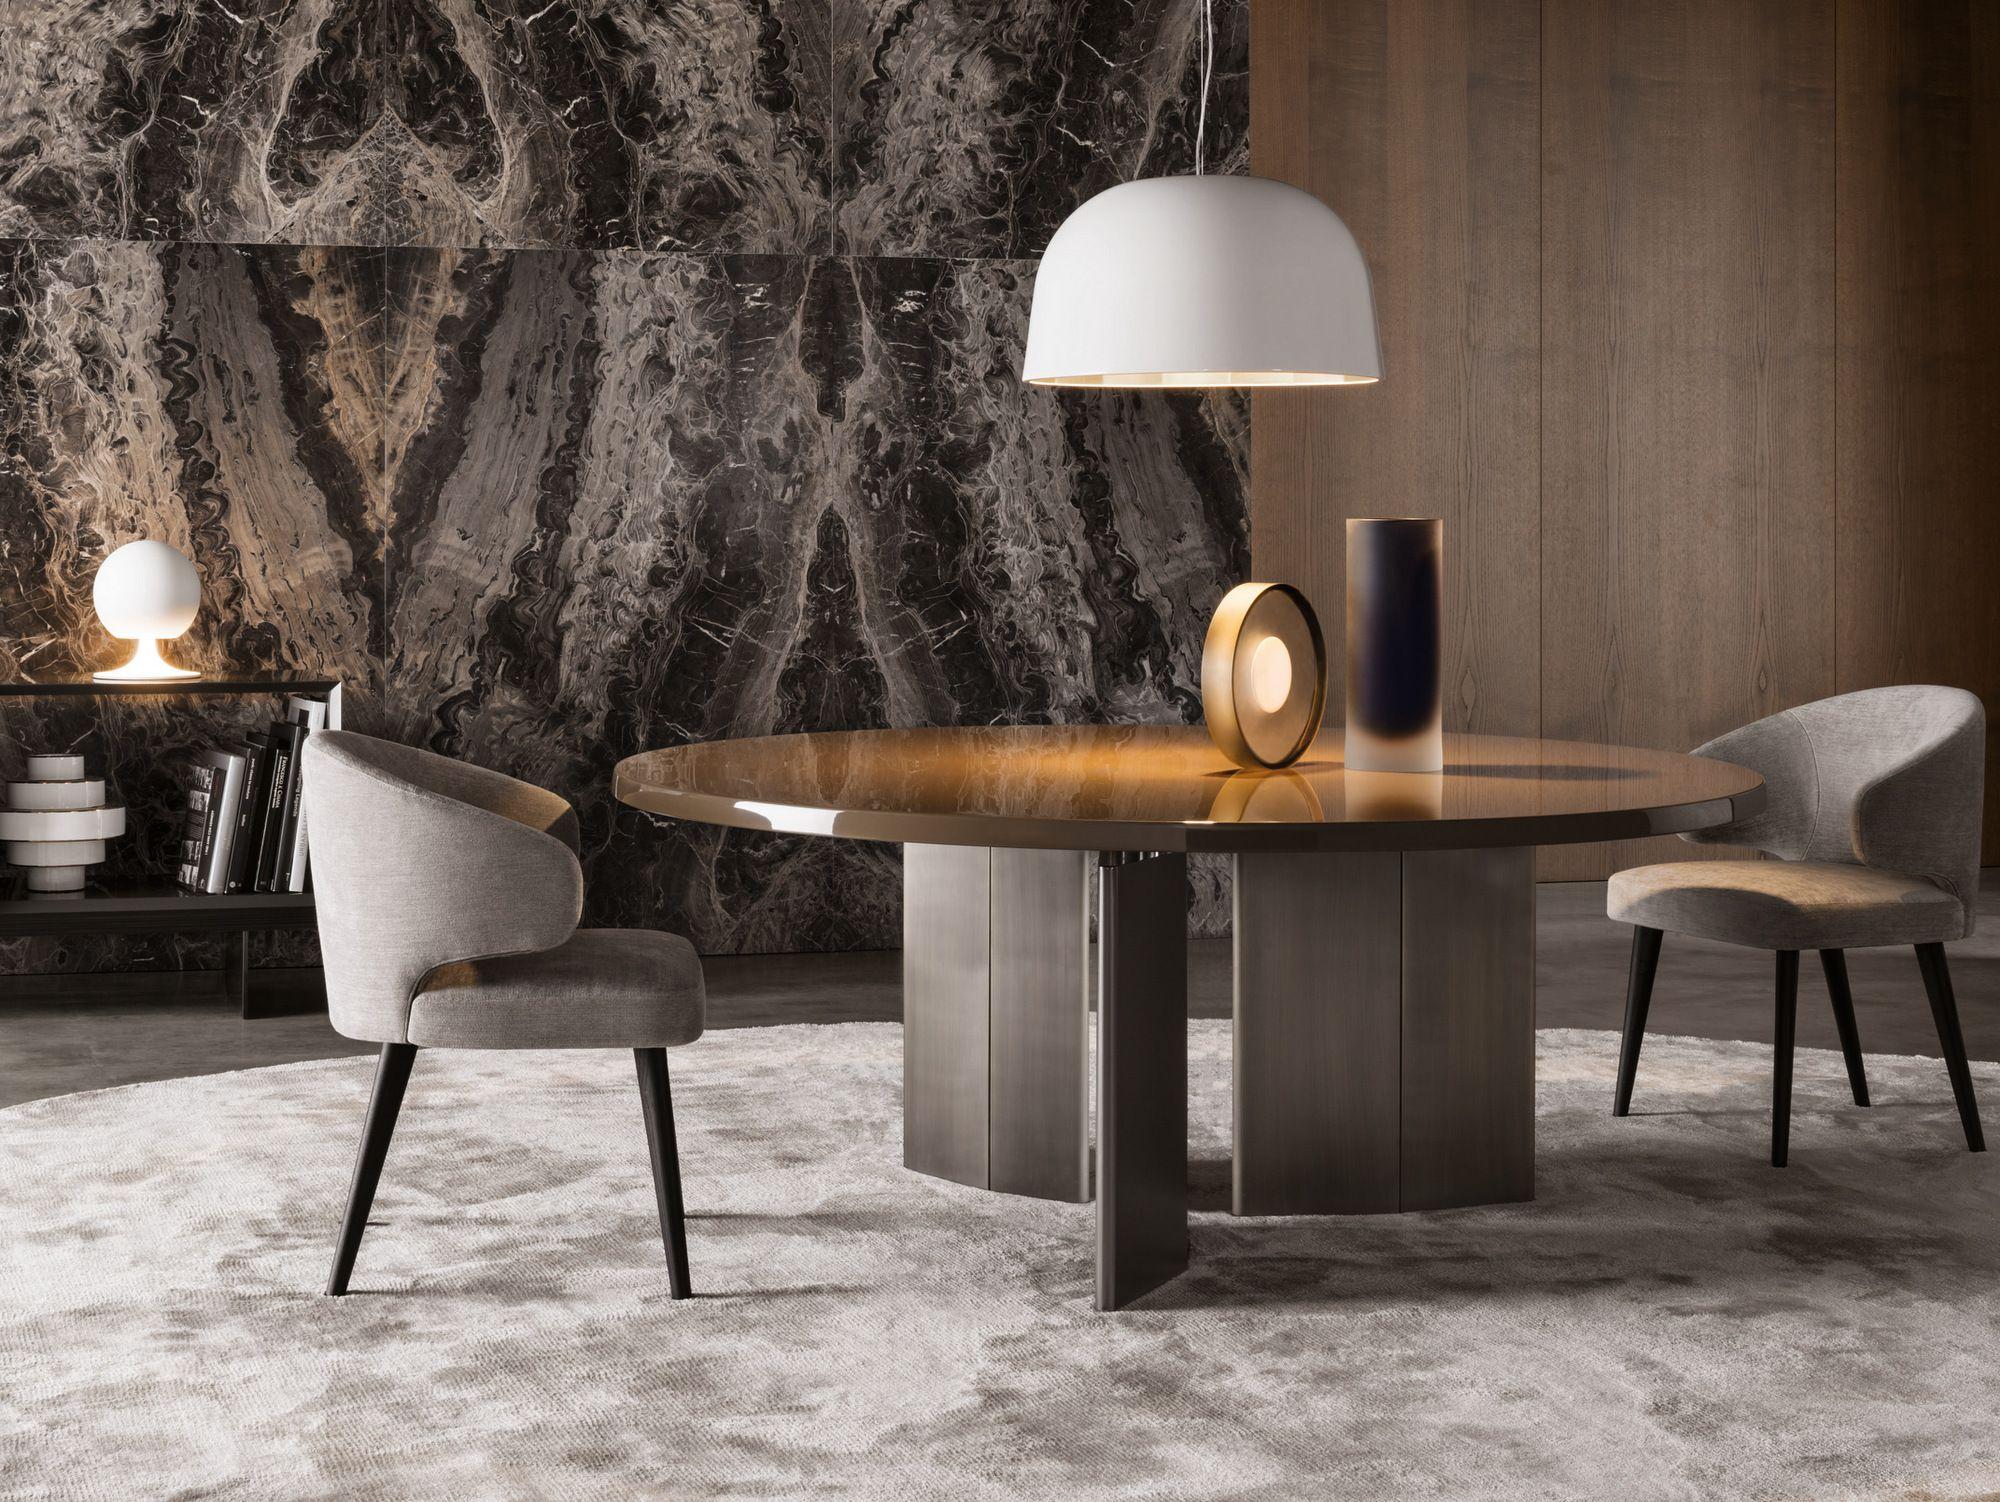 Round Table S Morgan Round Table By Minotti Design Rodolfo Dordoni Tables